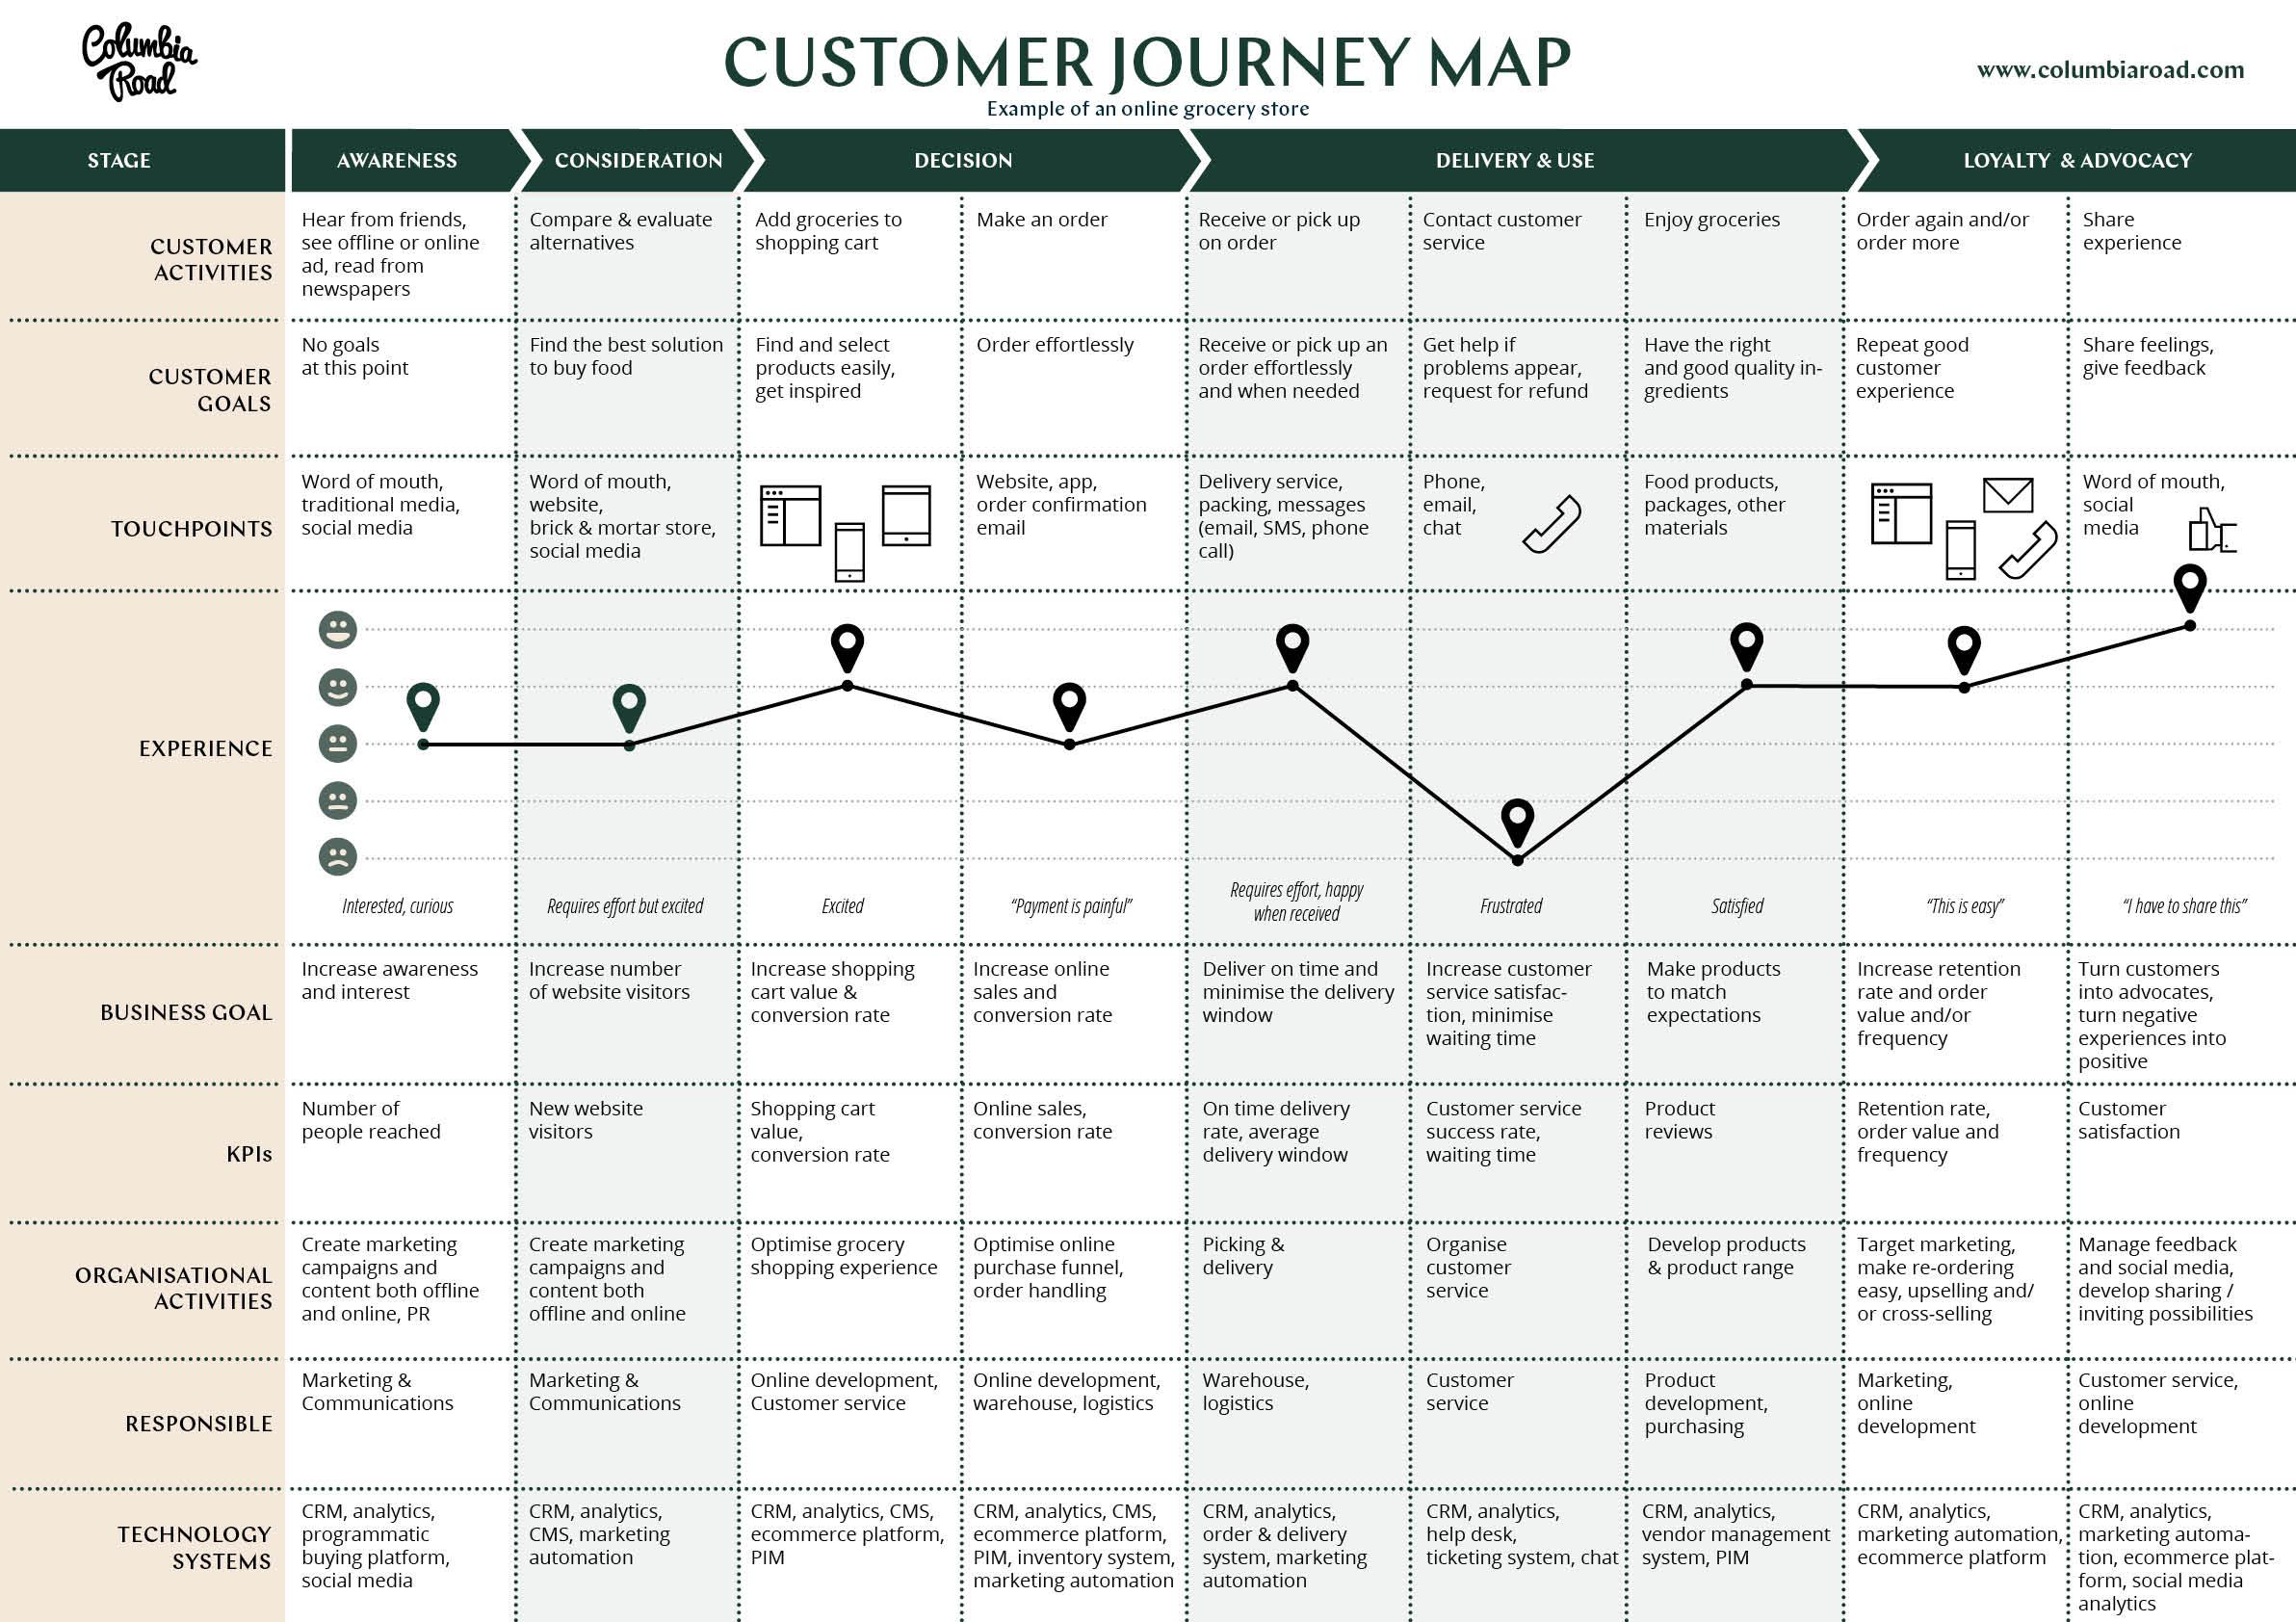 Customer_Journey_Map